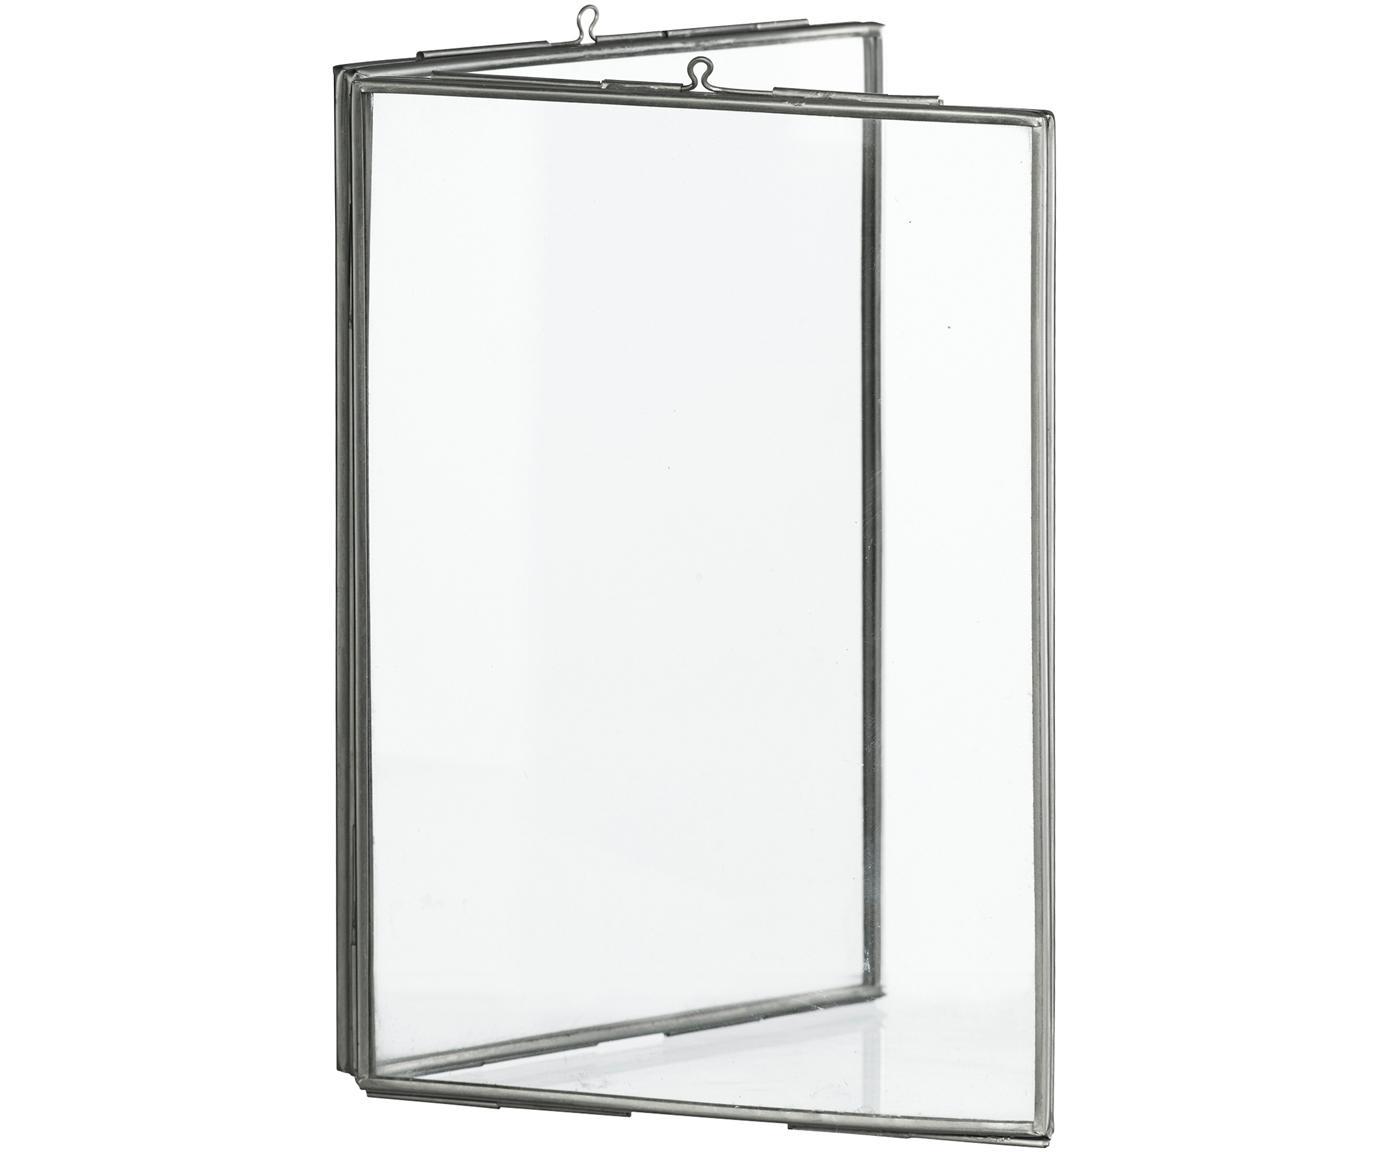 Marco Double, Vidrio, metal, recubierto, Acero inoxidable, 10 x 15 cm